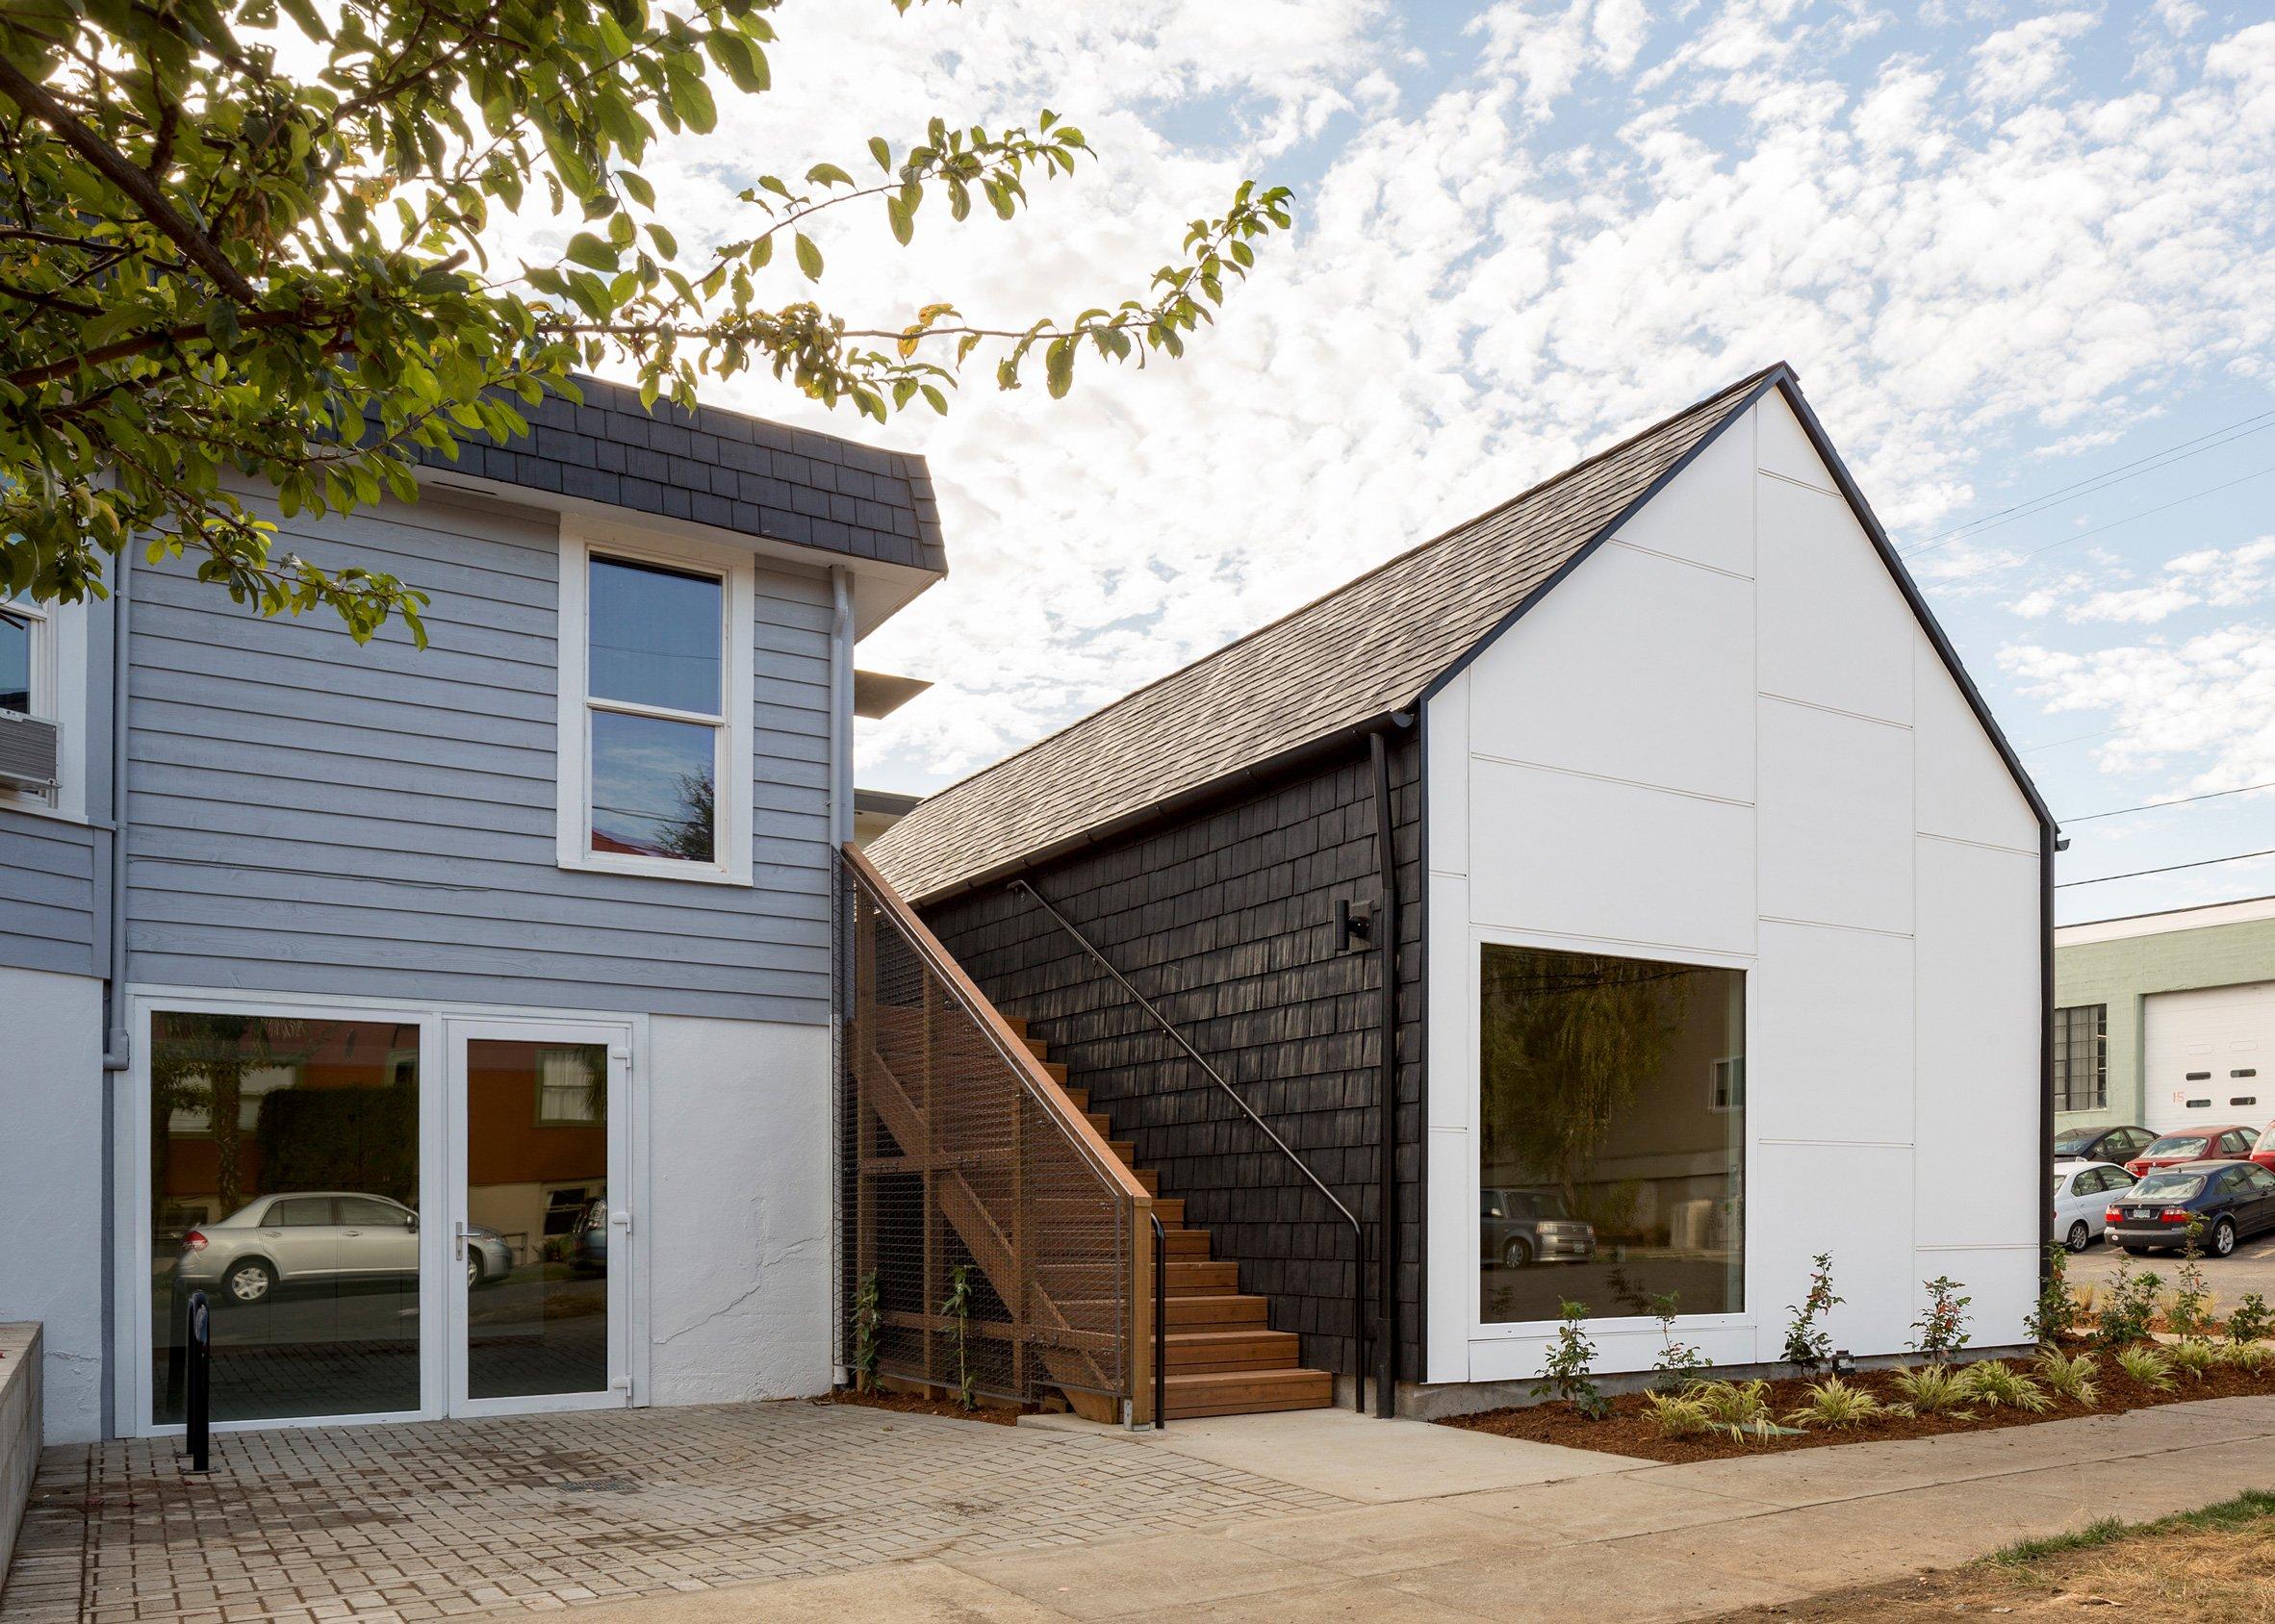 Laura's Place, Portland, Oregon, by Architecture Building Culture